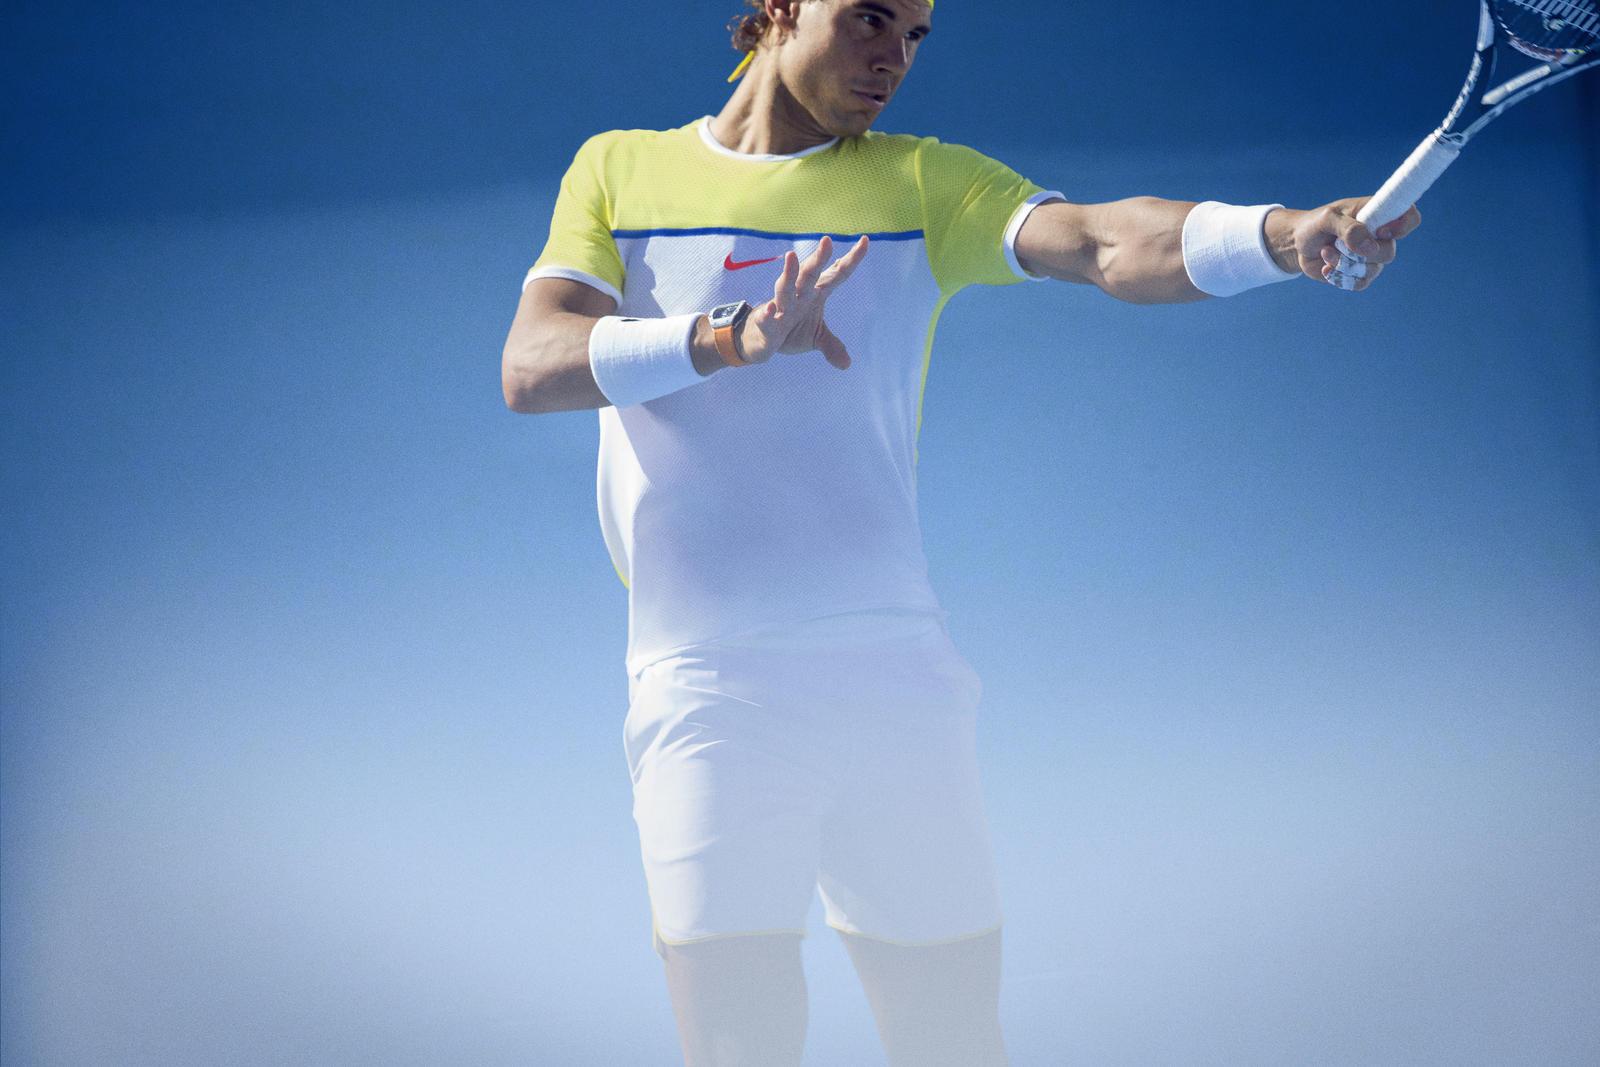 Rafael Nadal nike tennis outfit australian open 2016